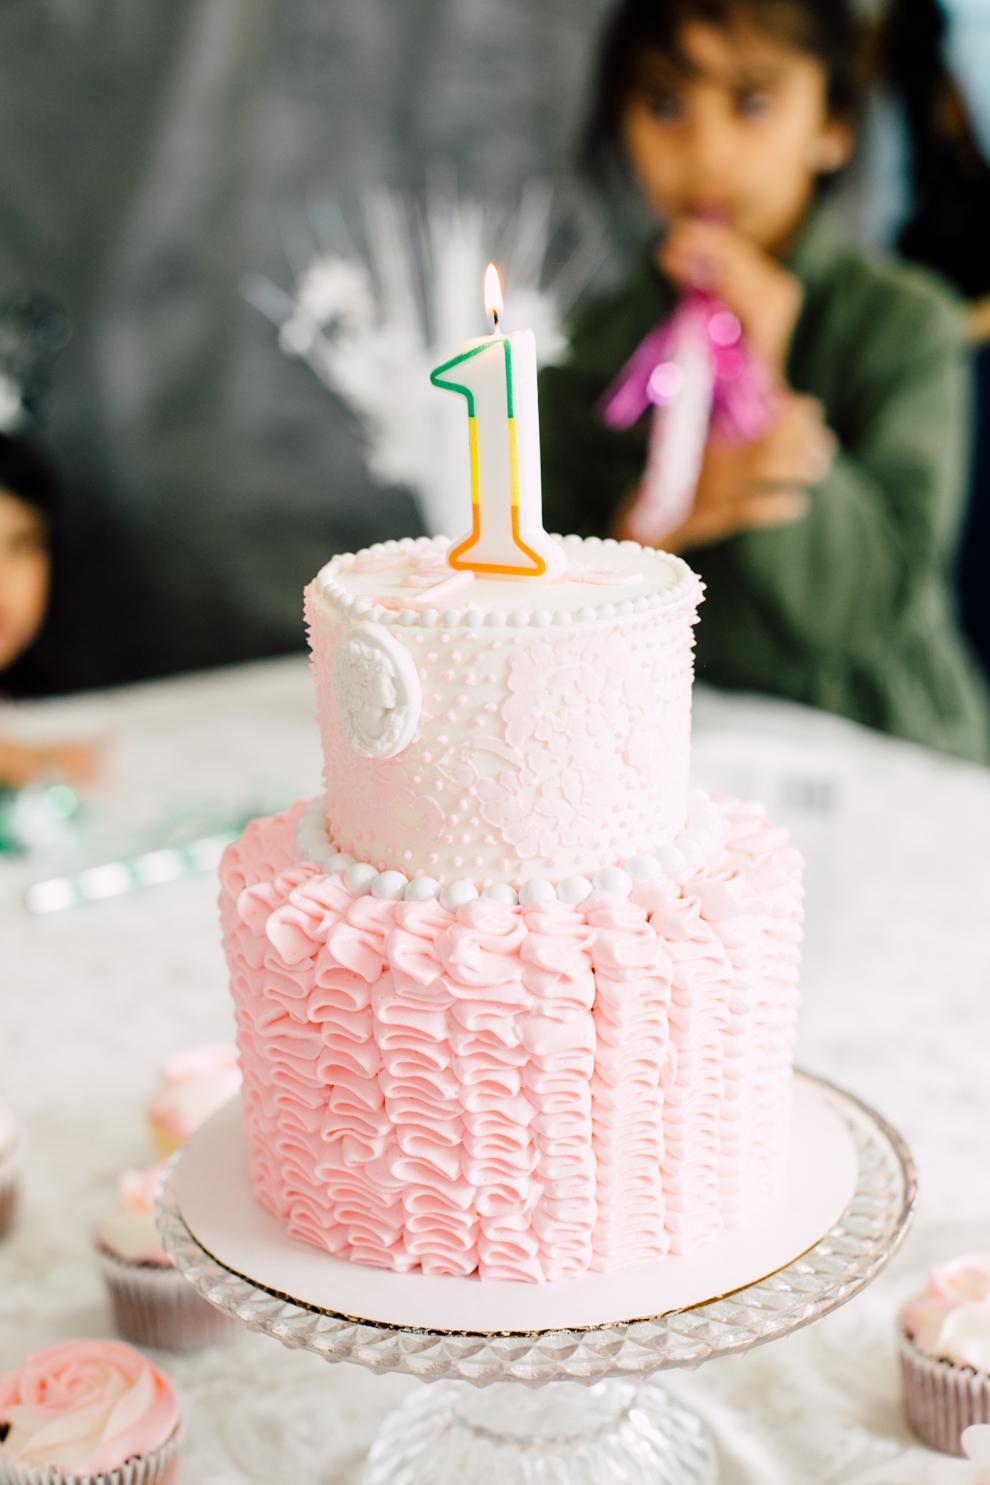 041-one-year-birthday-party-event-photography-lynden-bellingham-katheryn-moran-mira.jpg